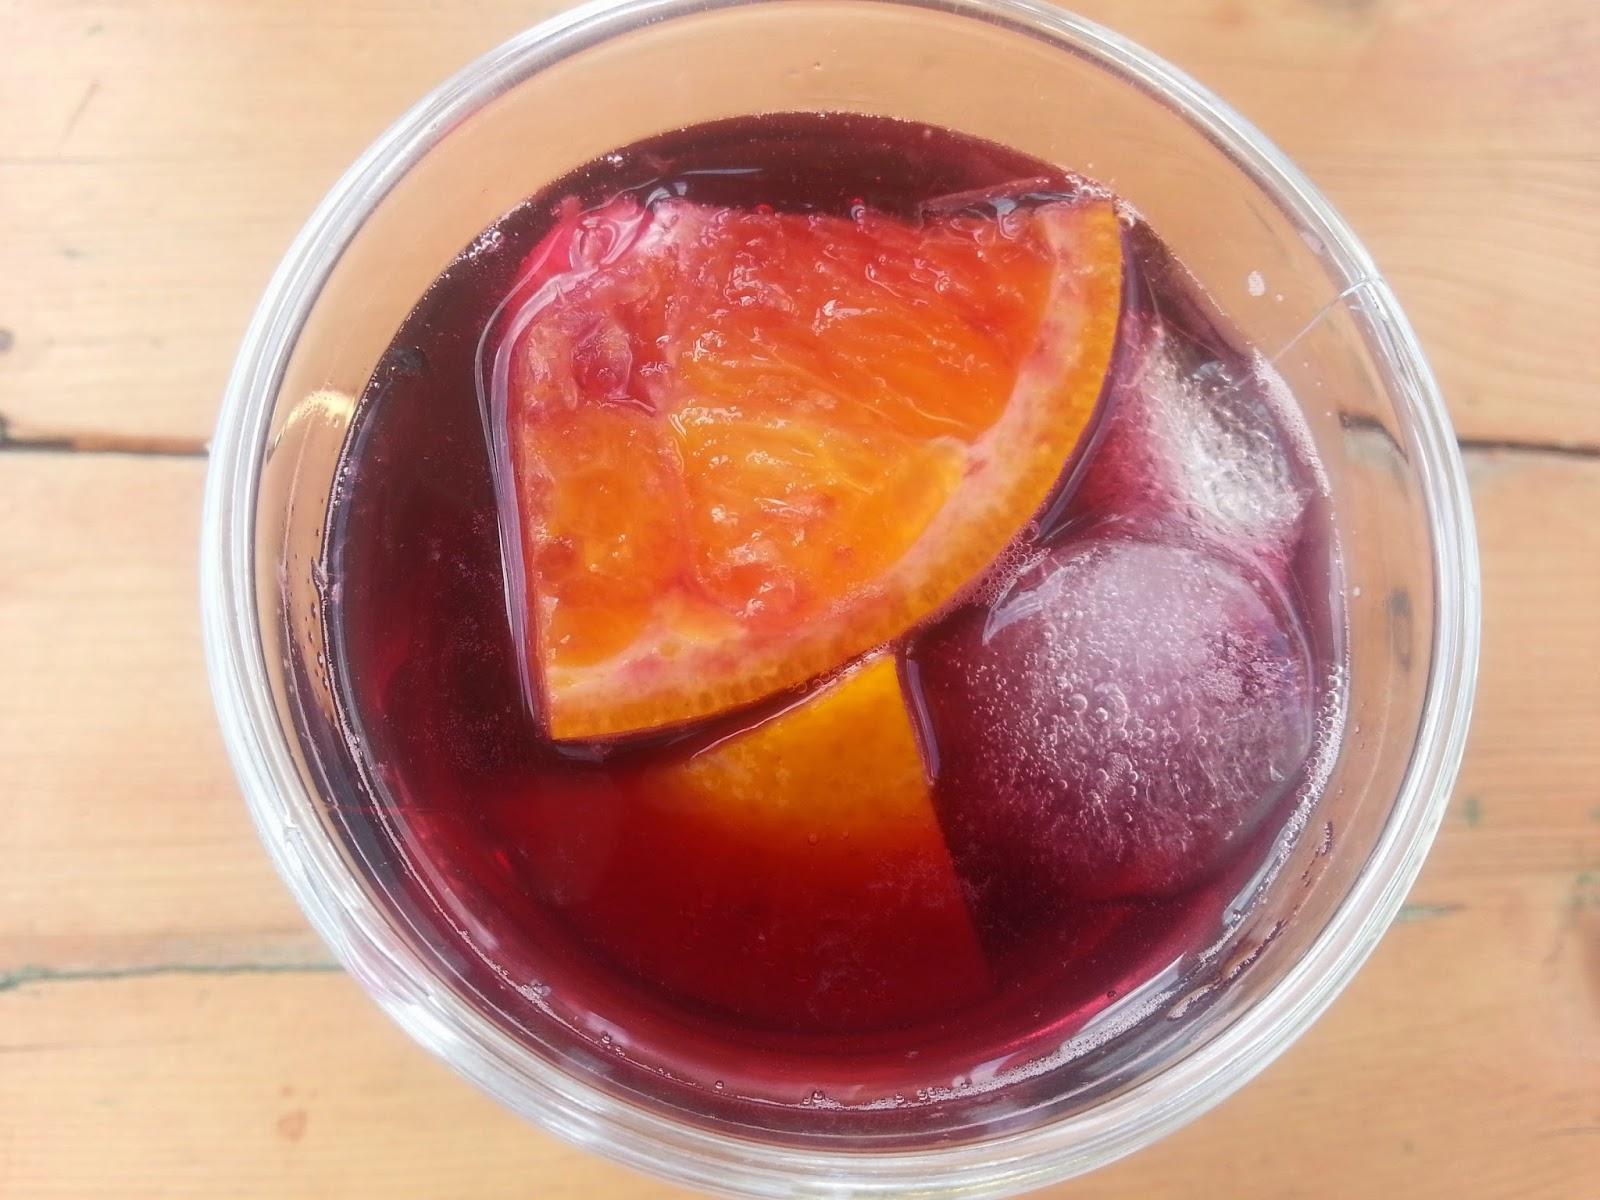 Sangria - Soul drink